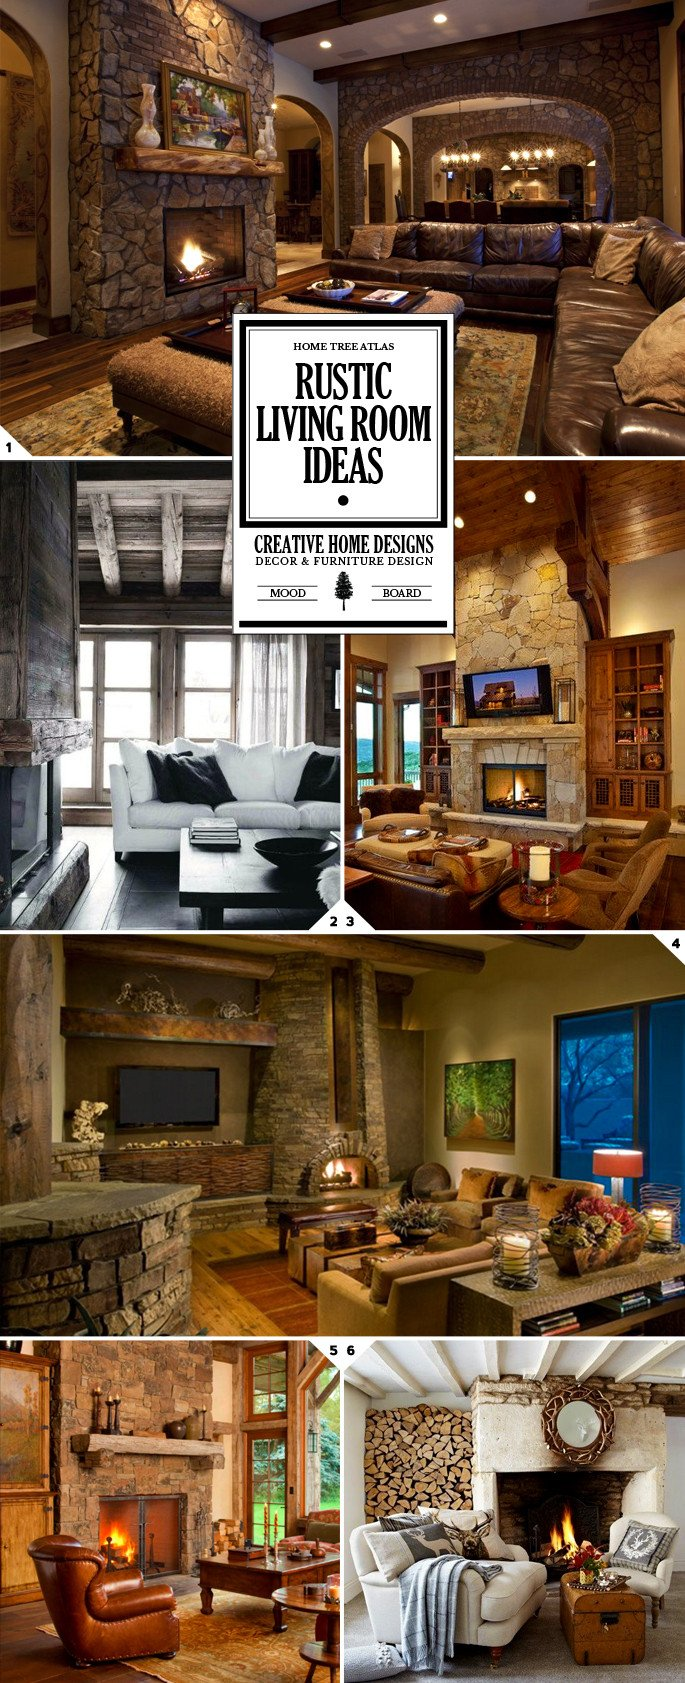 Diy Rustic Living Room Decor Rustic Living Room Ideas Decor and Furniture Designs